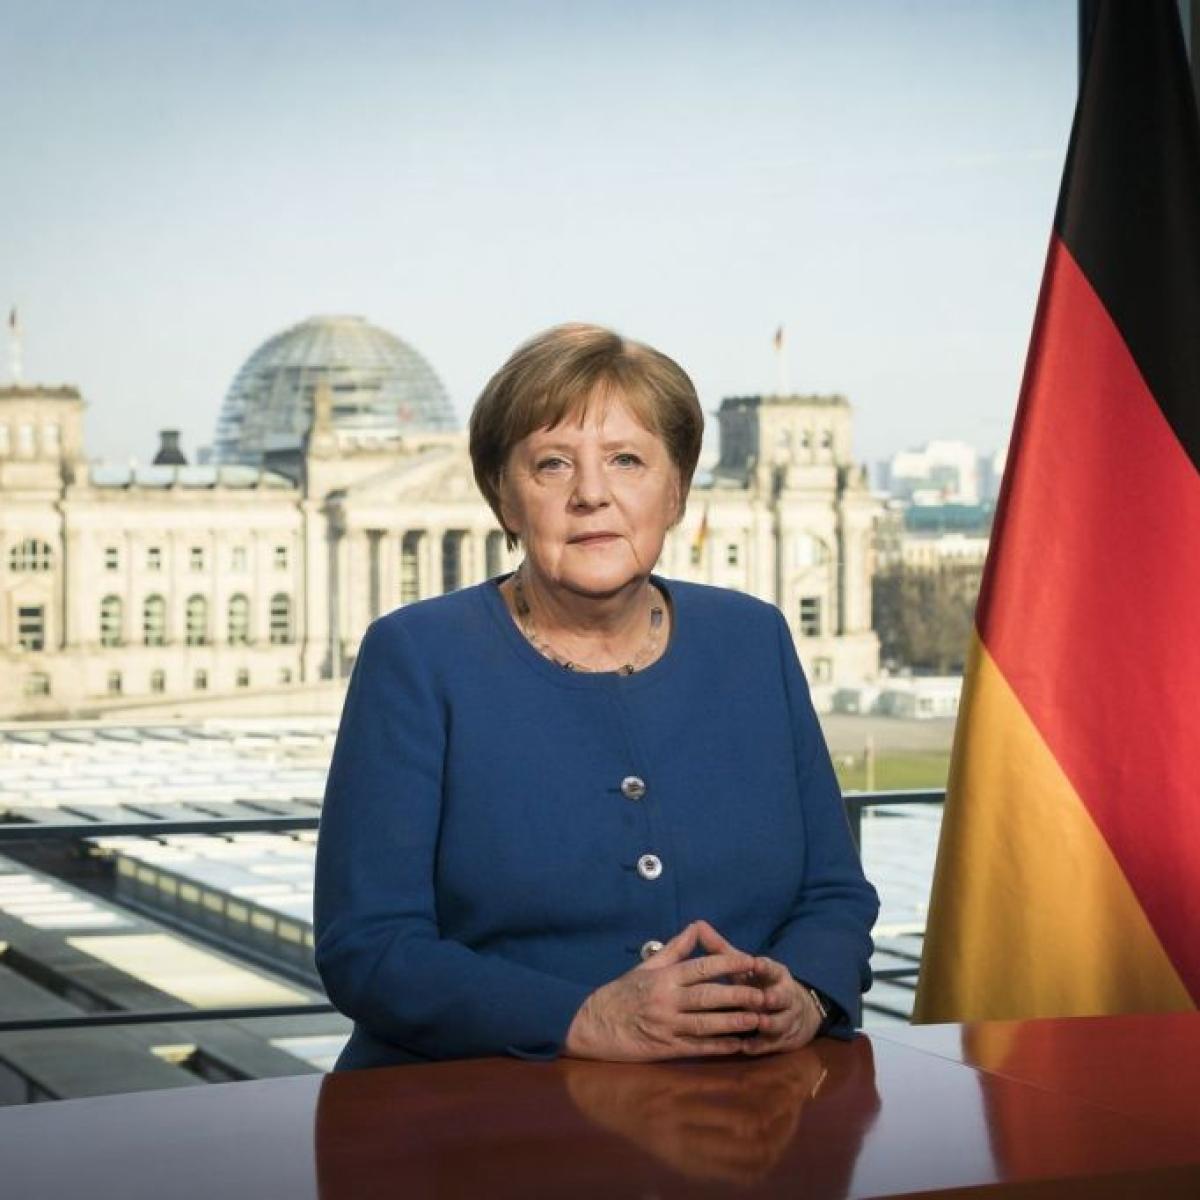 German Chancellor Angela Merkel tests negative for coronavirus for third time